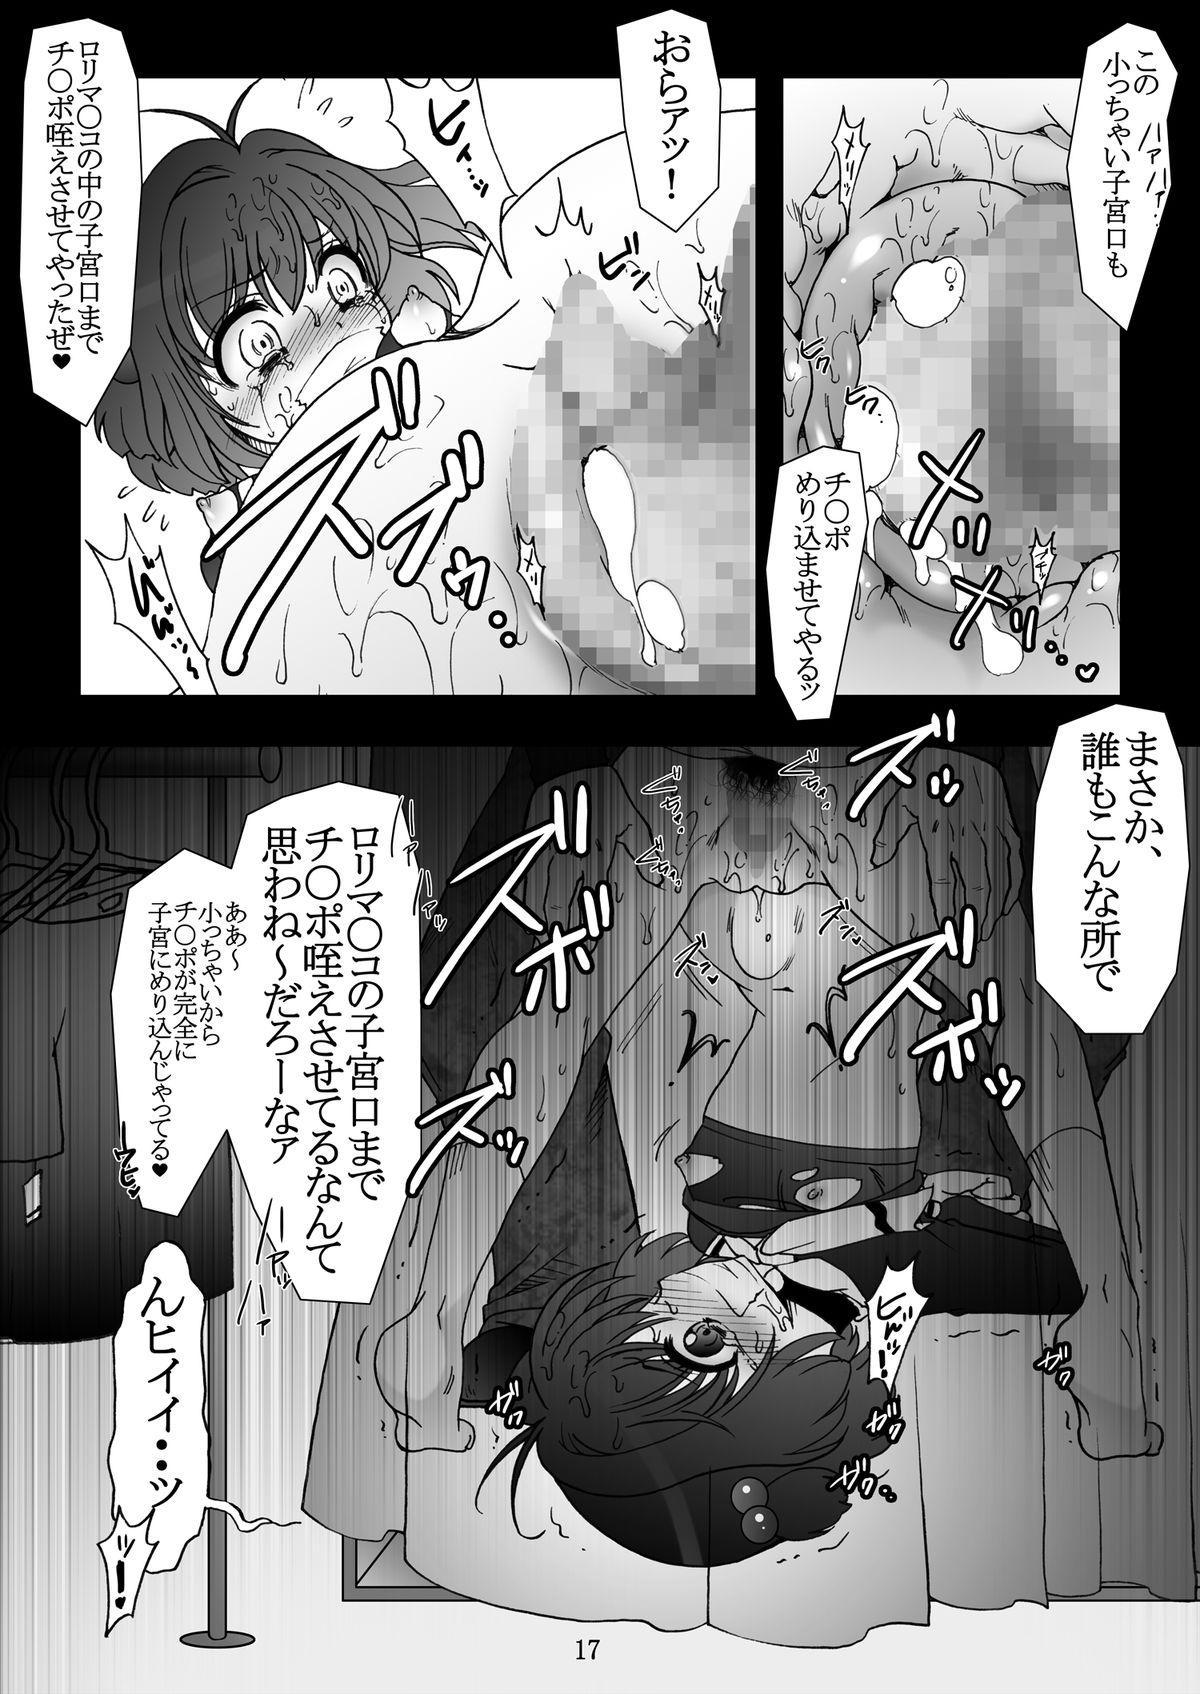 Sakura Slave to the Grind 16